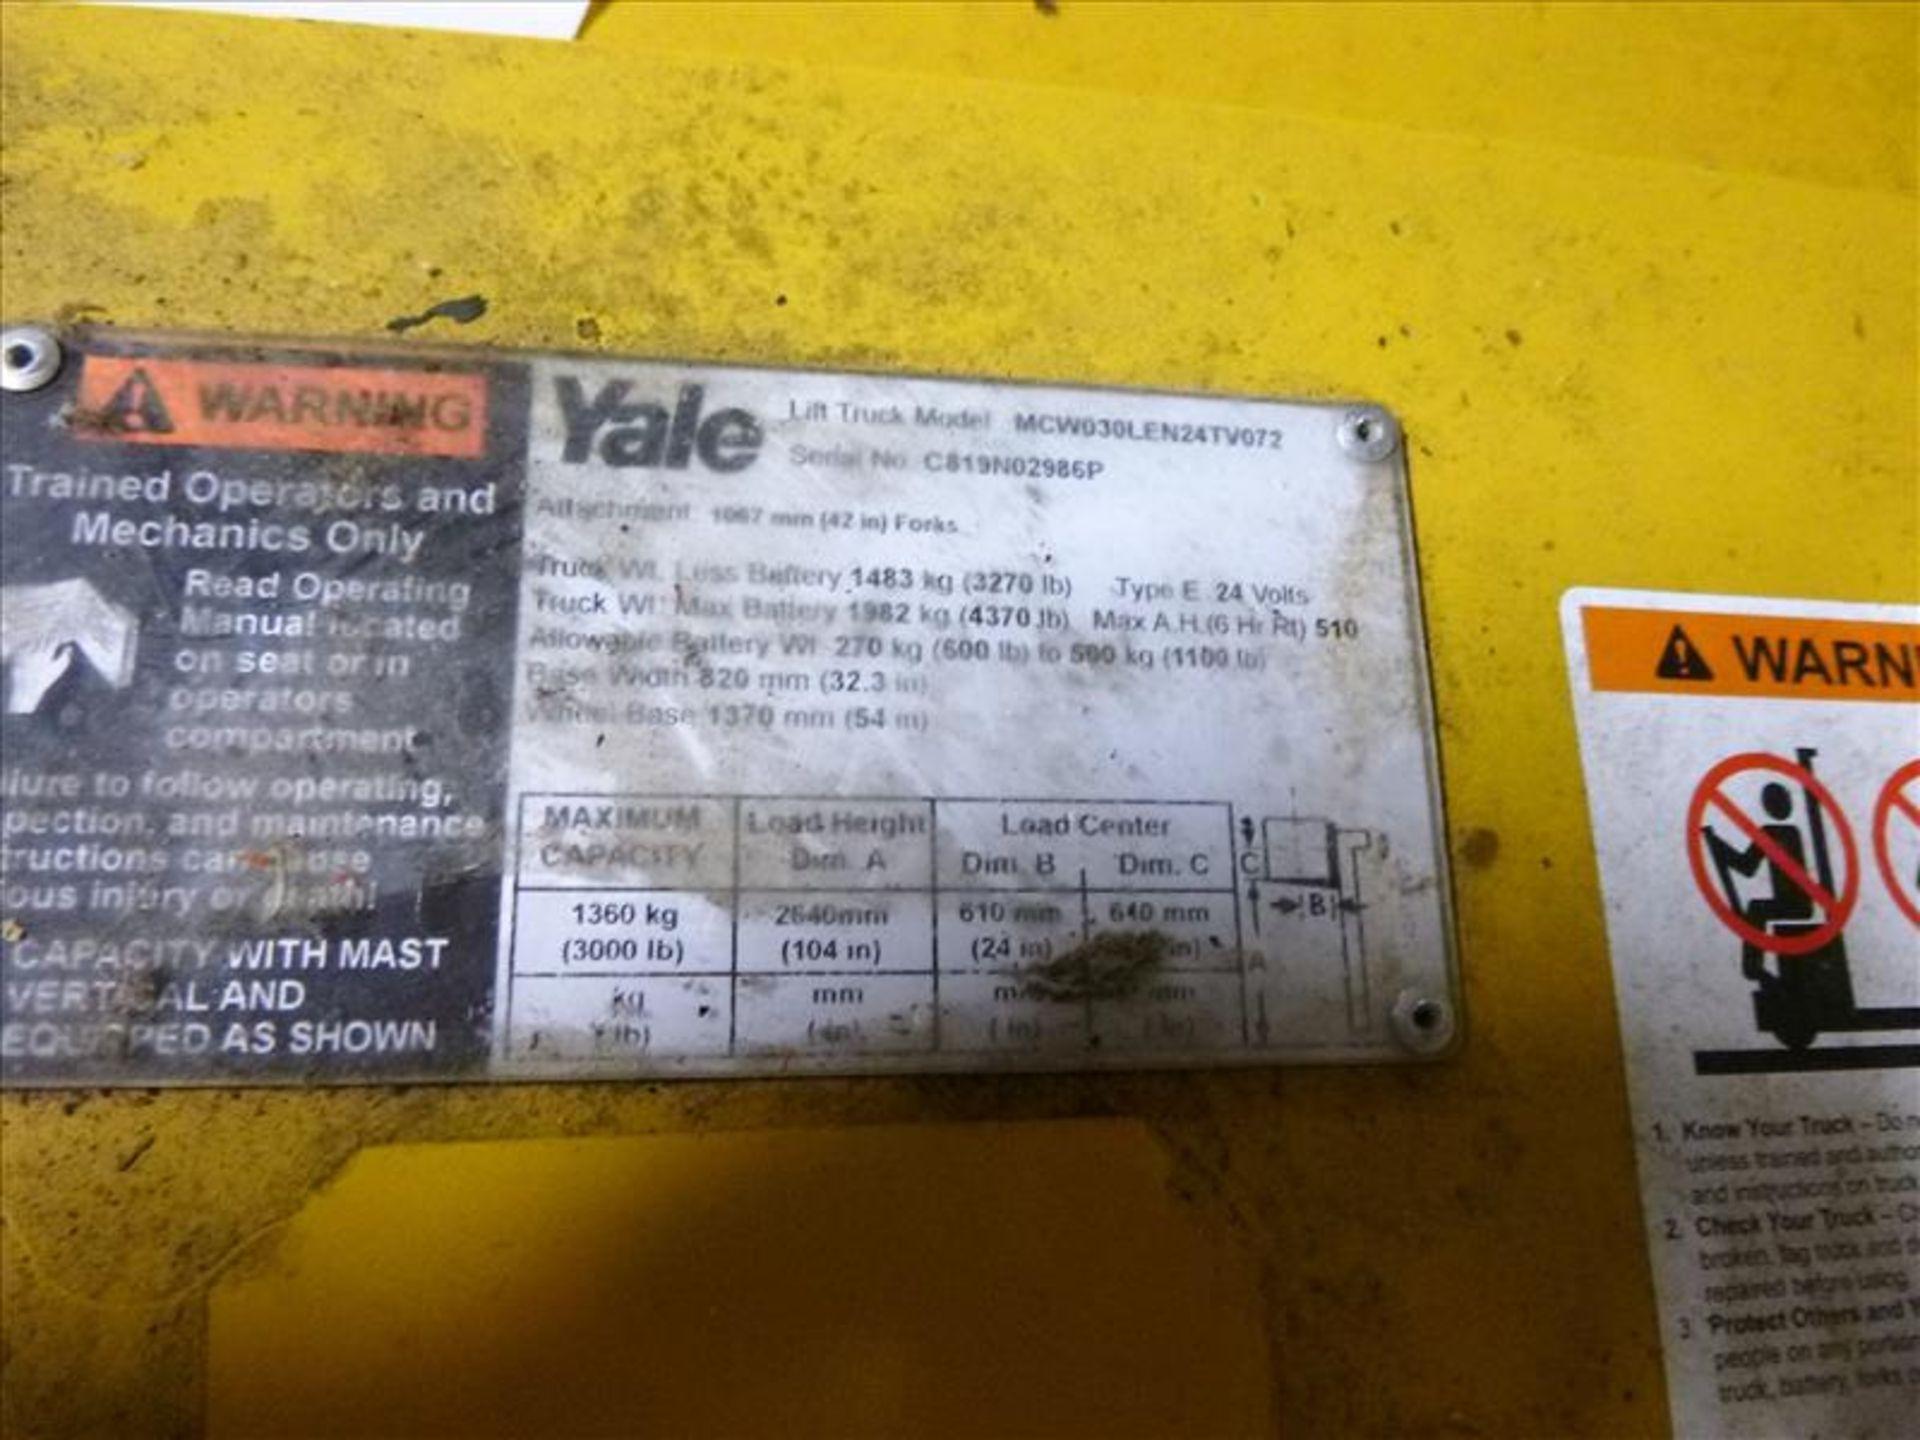 Lot 2025 - Yale walk-behind fork lift truck, mod. MCW030LEN24TV072, ser. no. C819N02986P, 24V electric, 3000